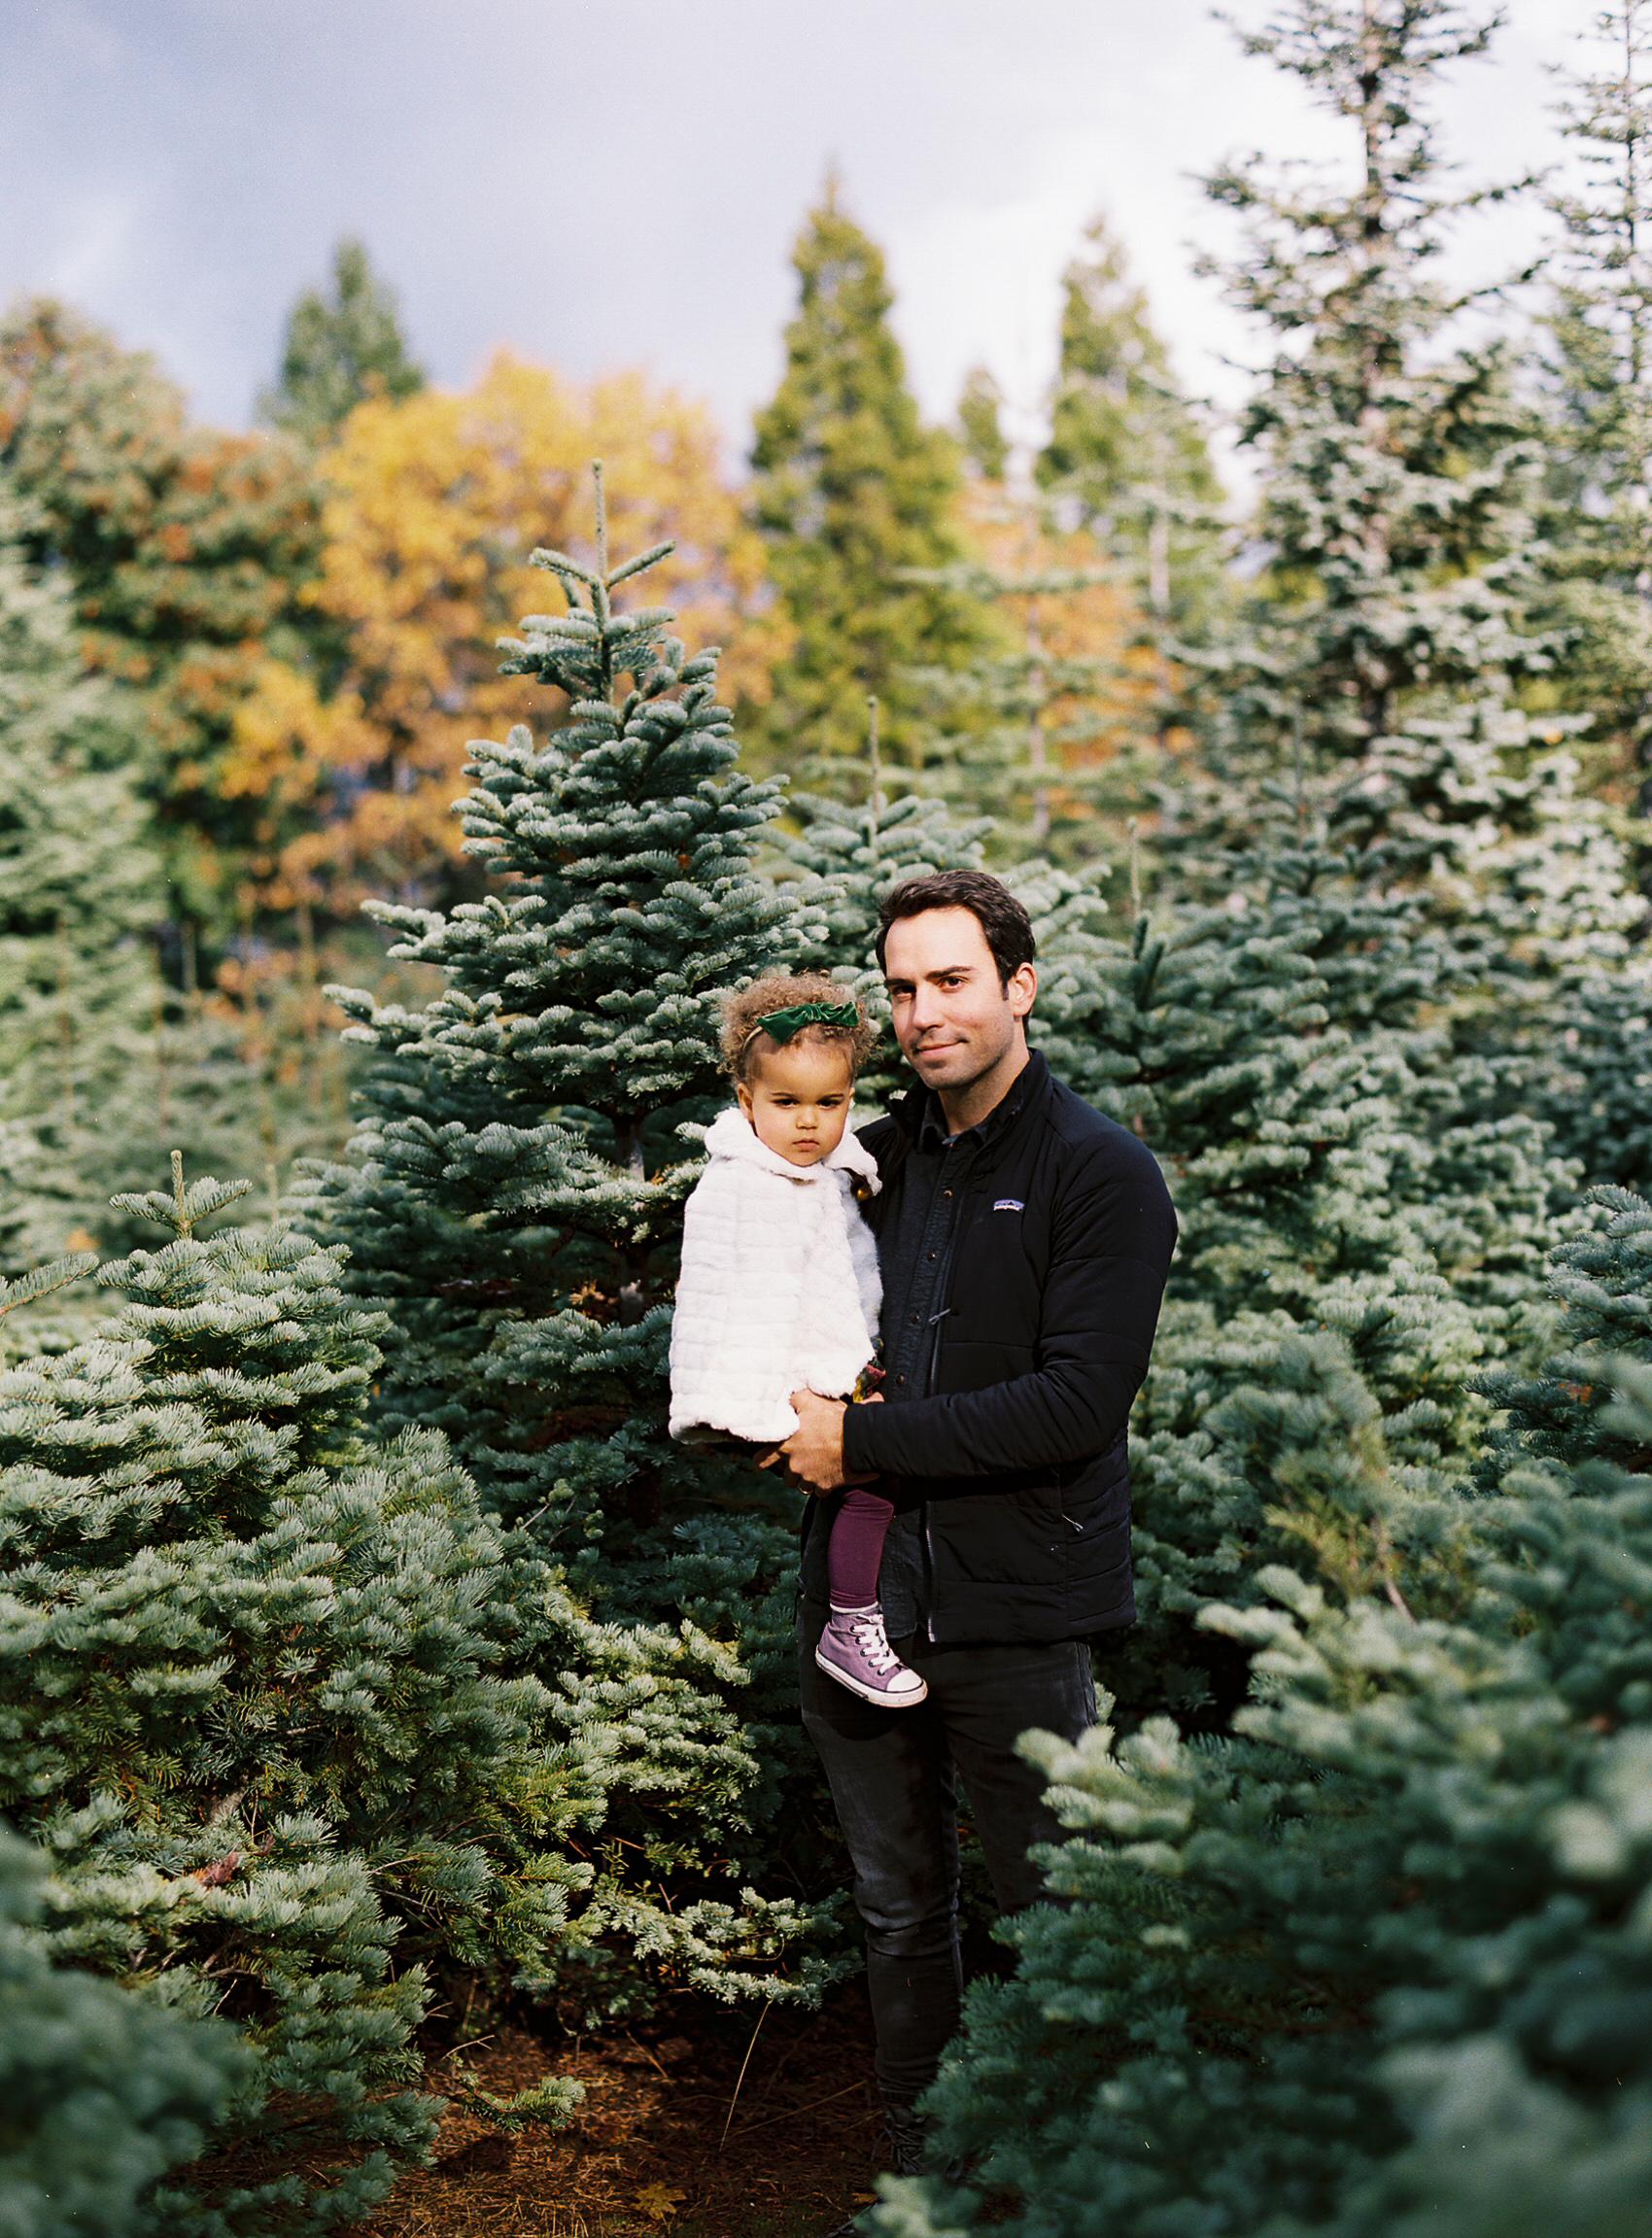 Christmas Tree Farm film photography by Rachel Sima Photography